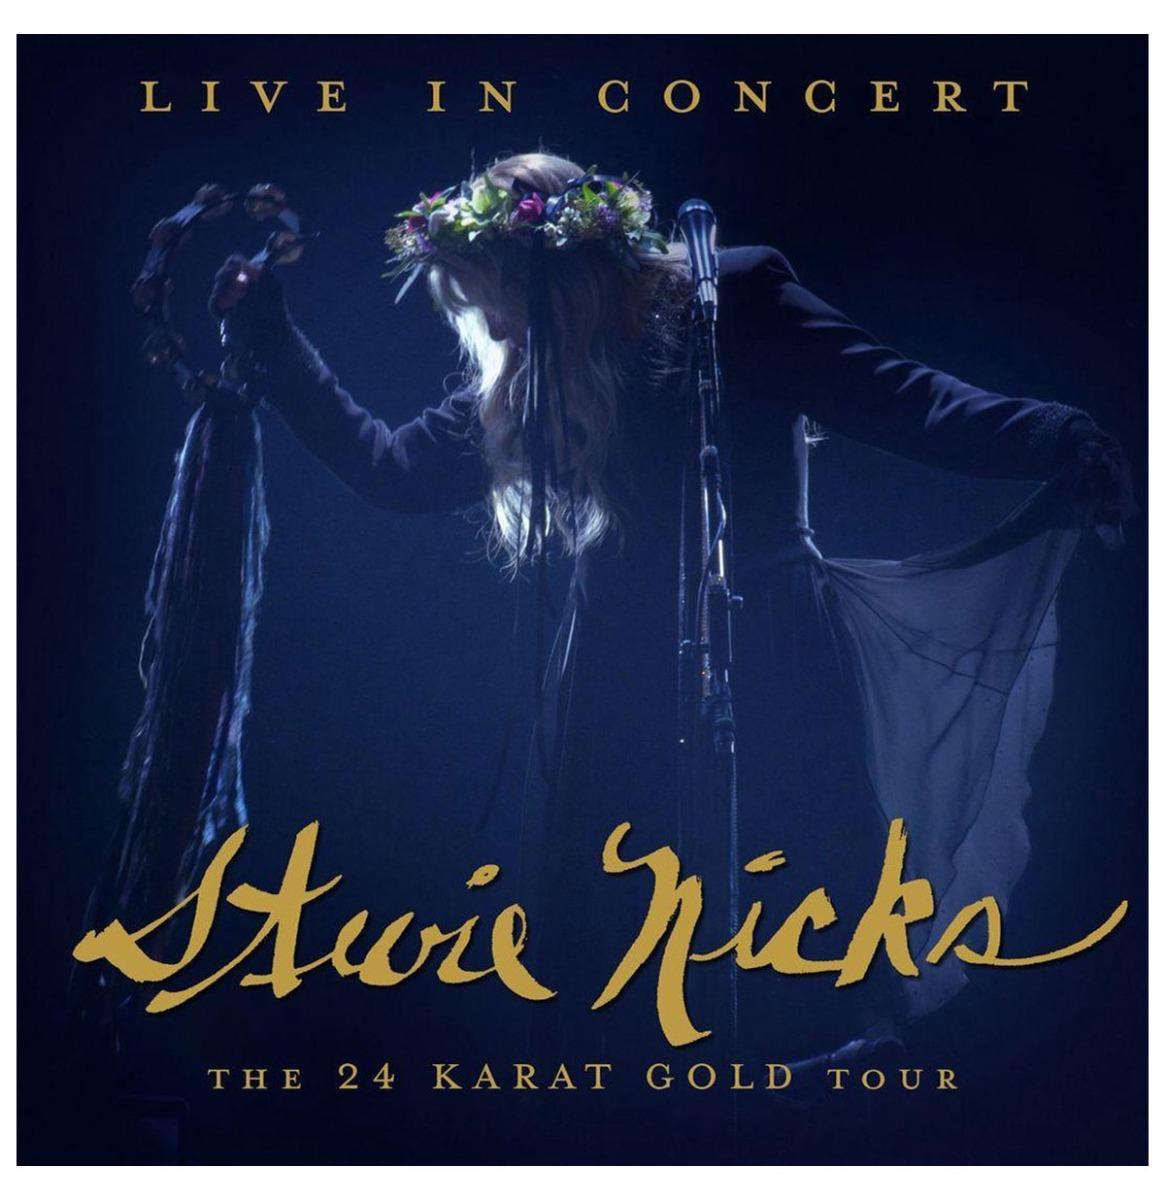 Stevie Nicks - Live In Concert - The 24 Karat Gold Tour 2-LP